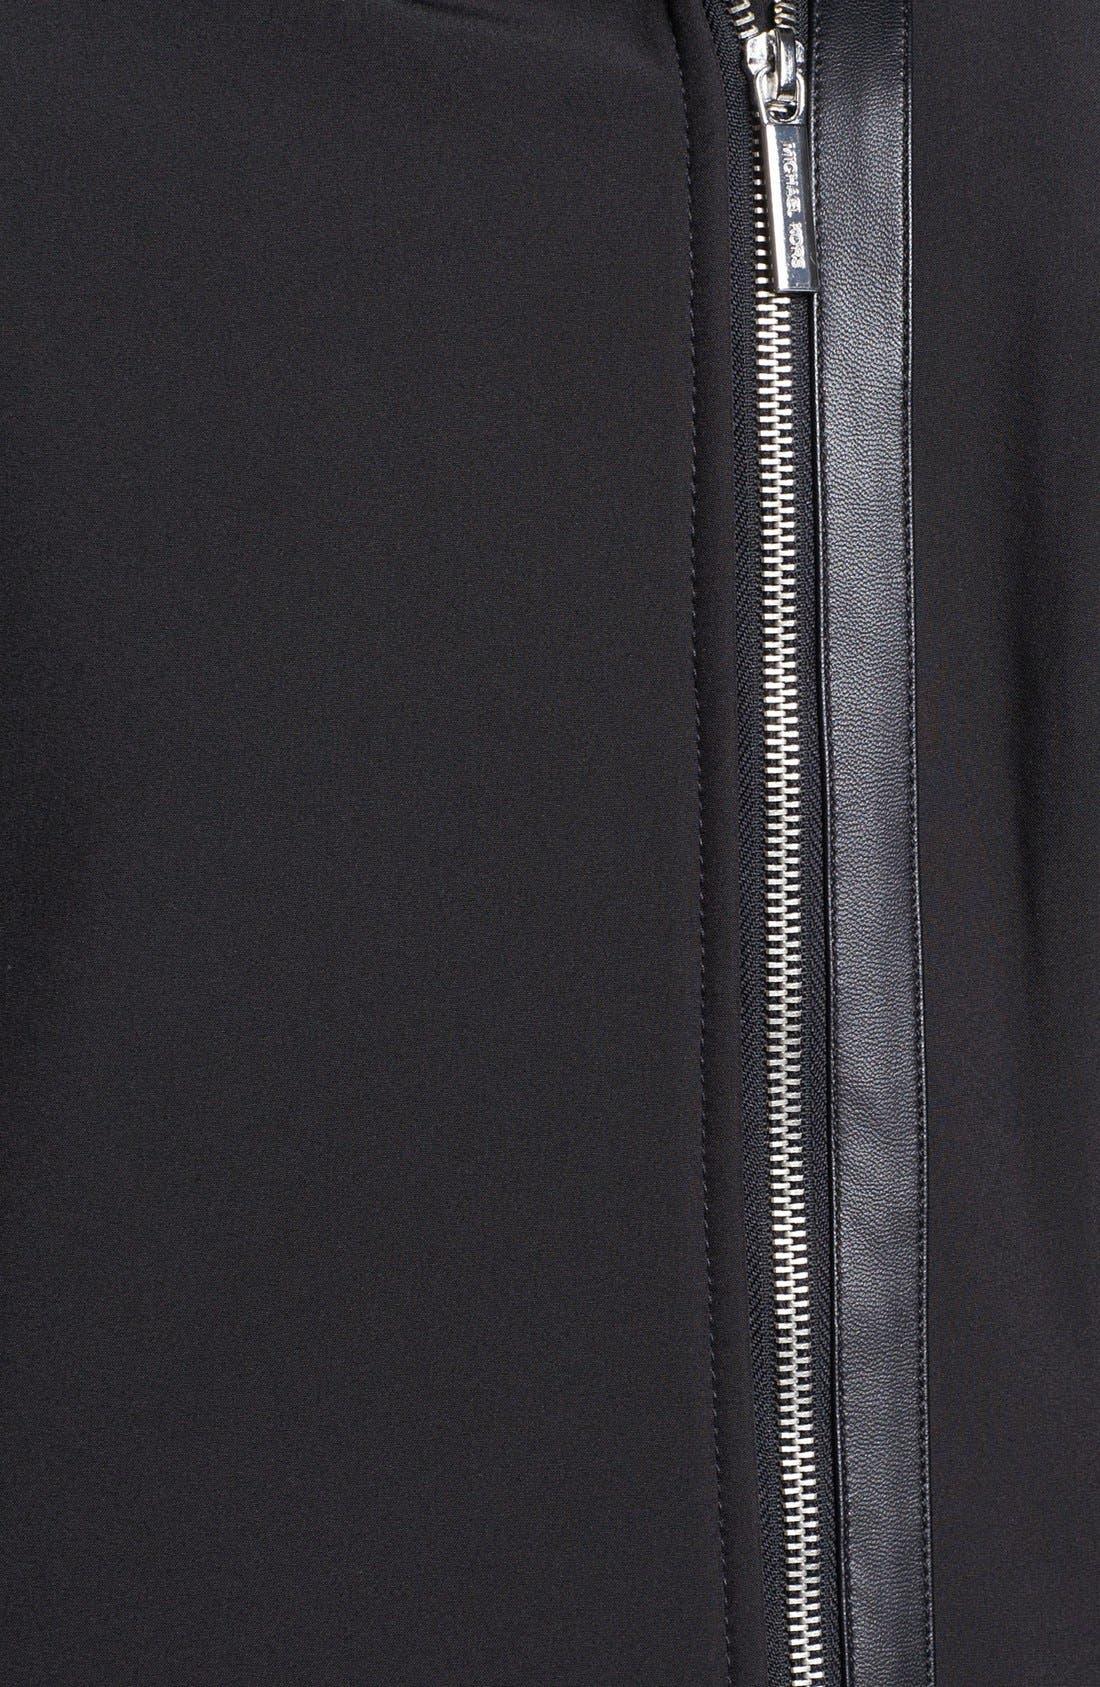 Alternate Image 3  - MICHAEL Michael Kors Hooded Faux Leather Trim Soft Shell Jacket (Plus Size)